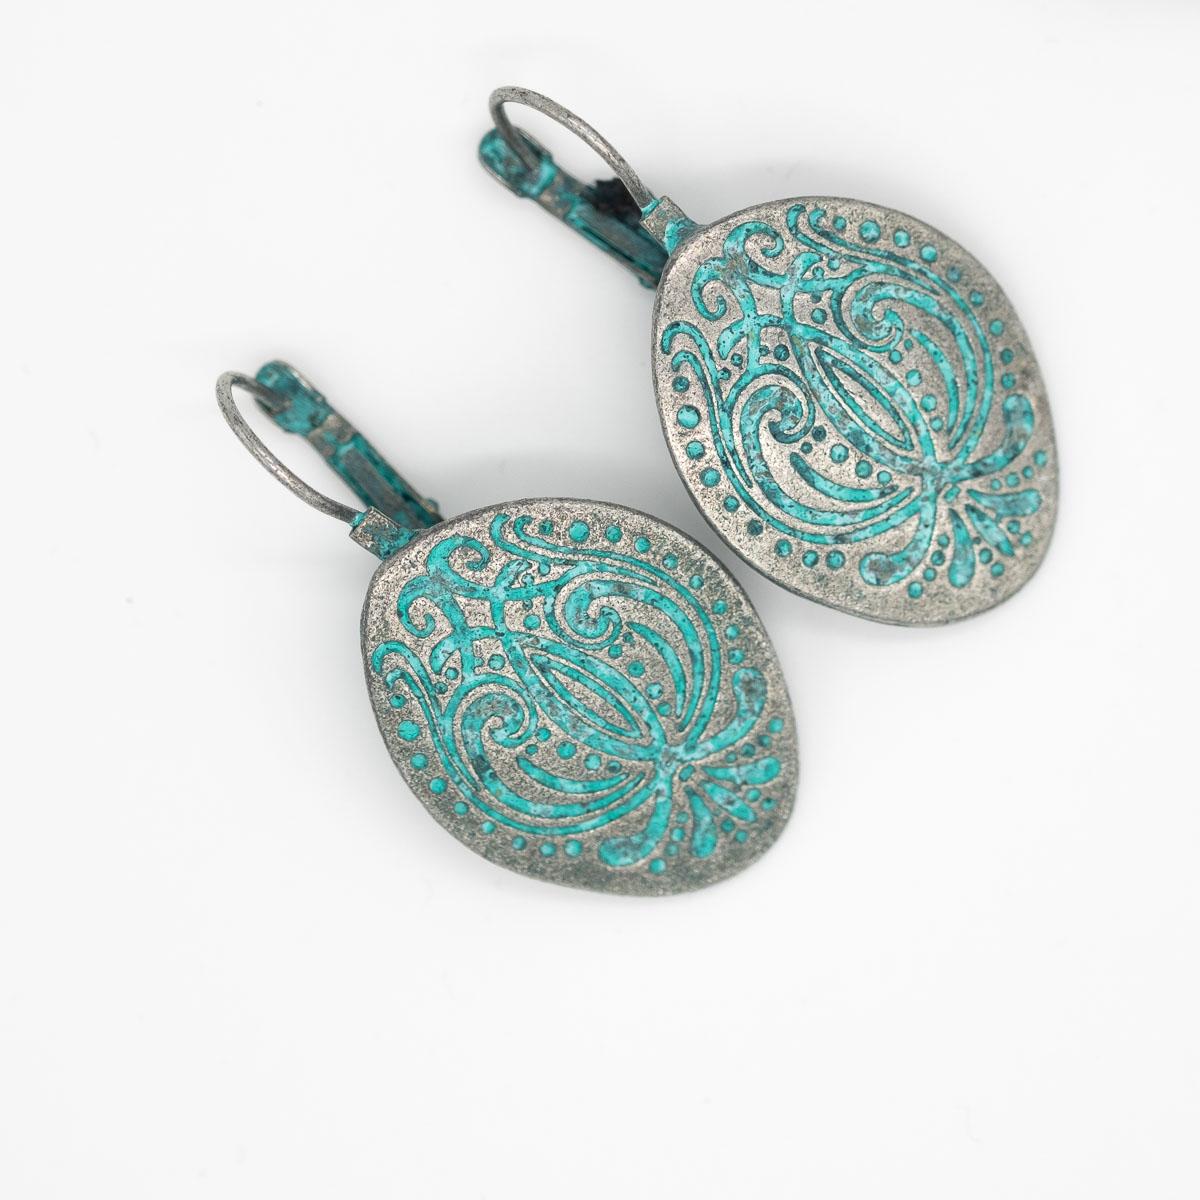 ORB-015 vintage oorbellen oud zilver